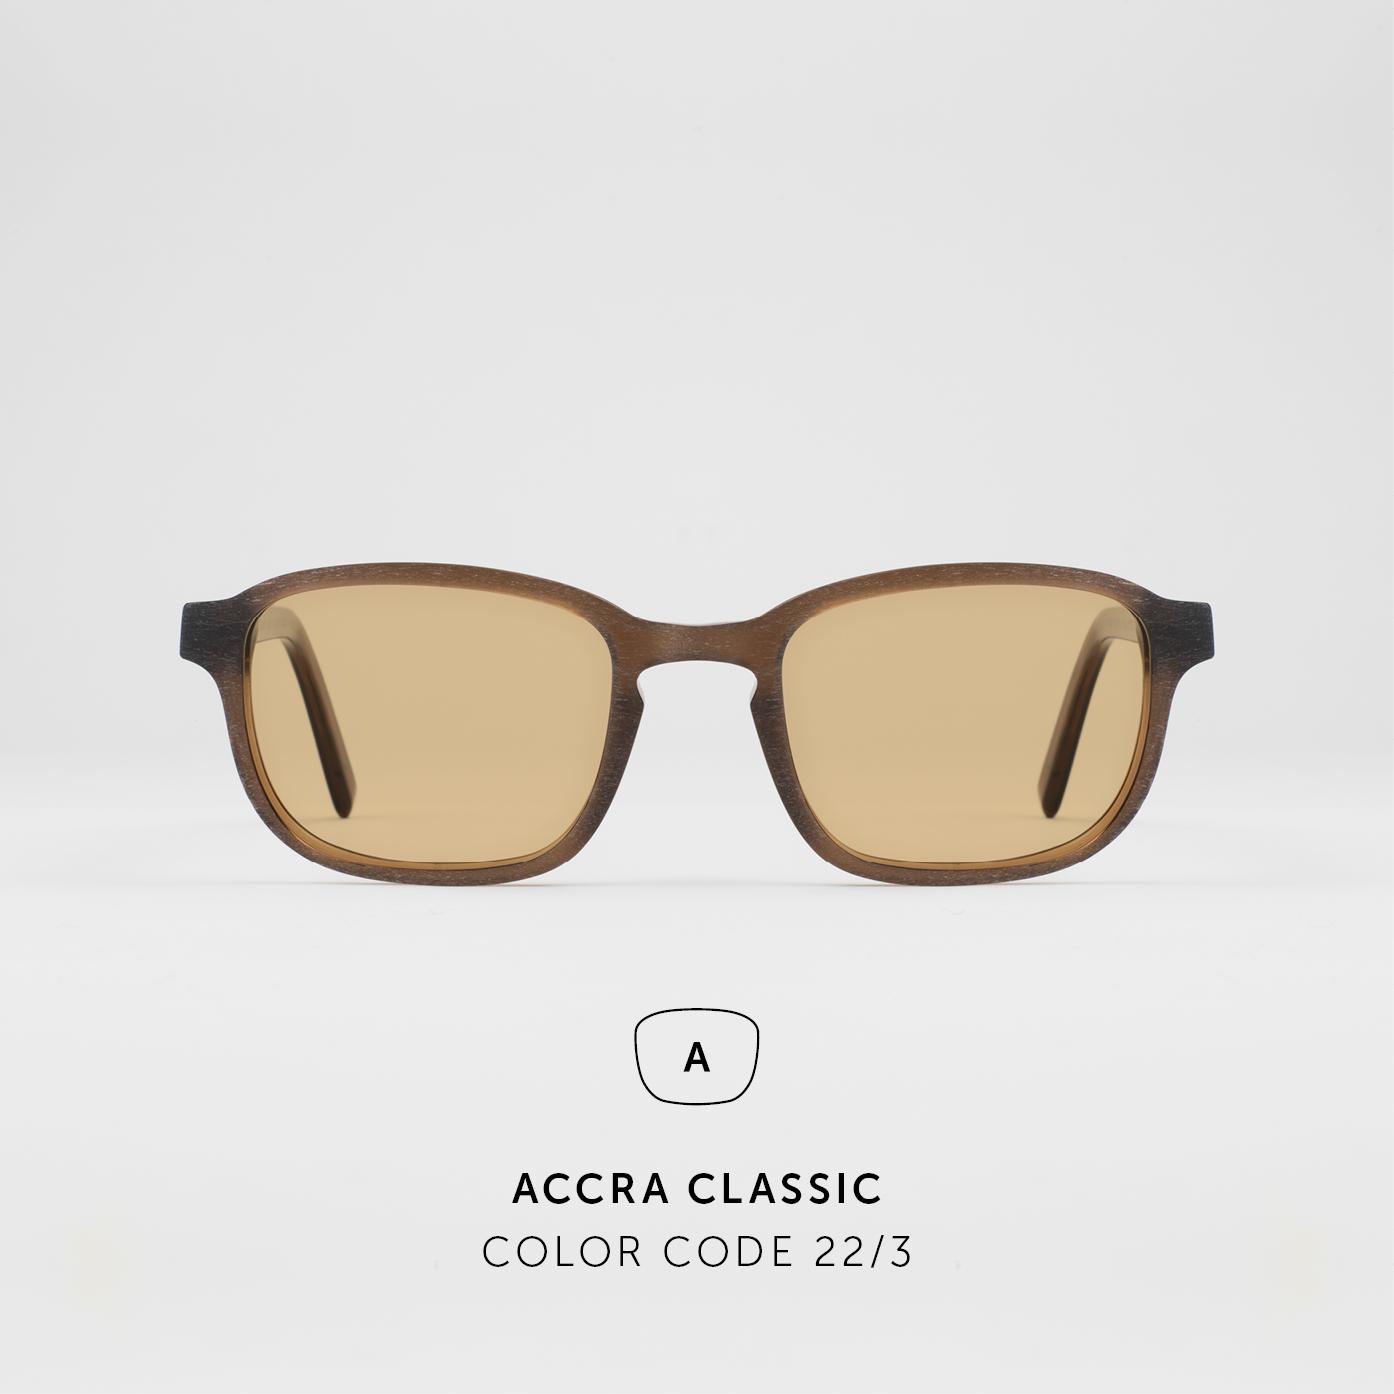 AccraClassic60.jpg